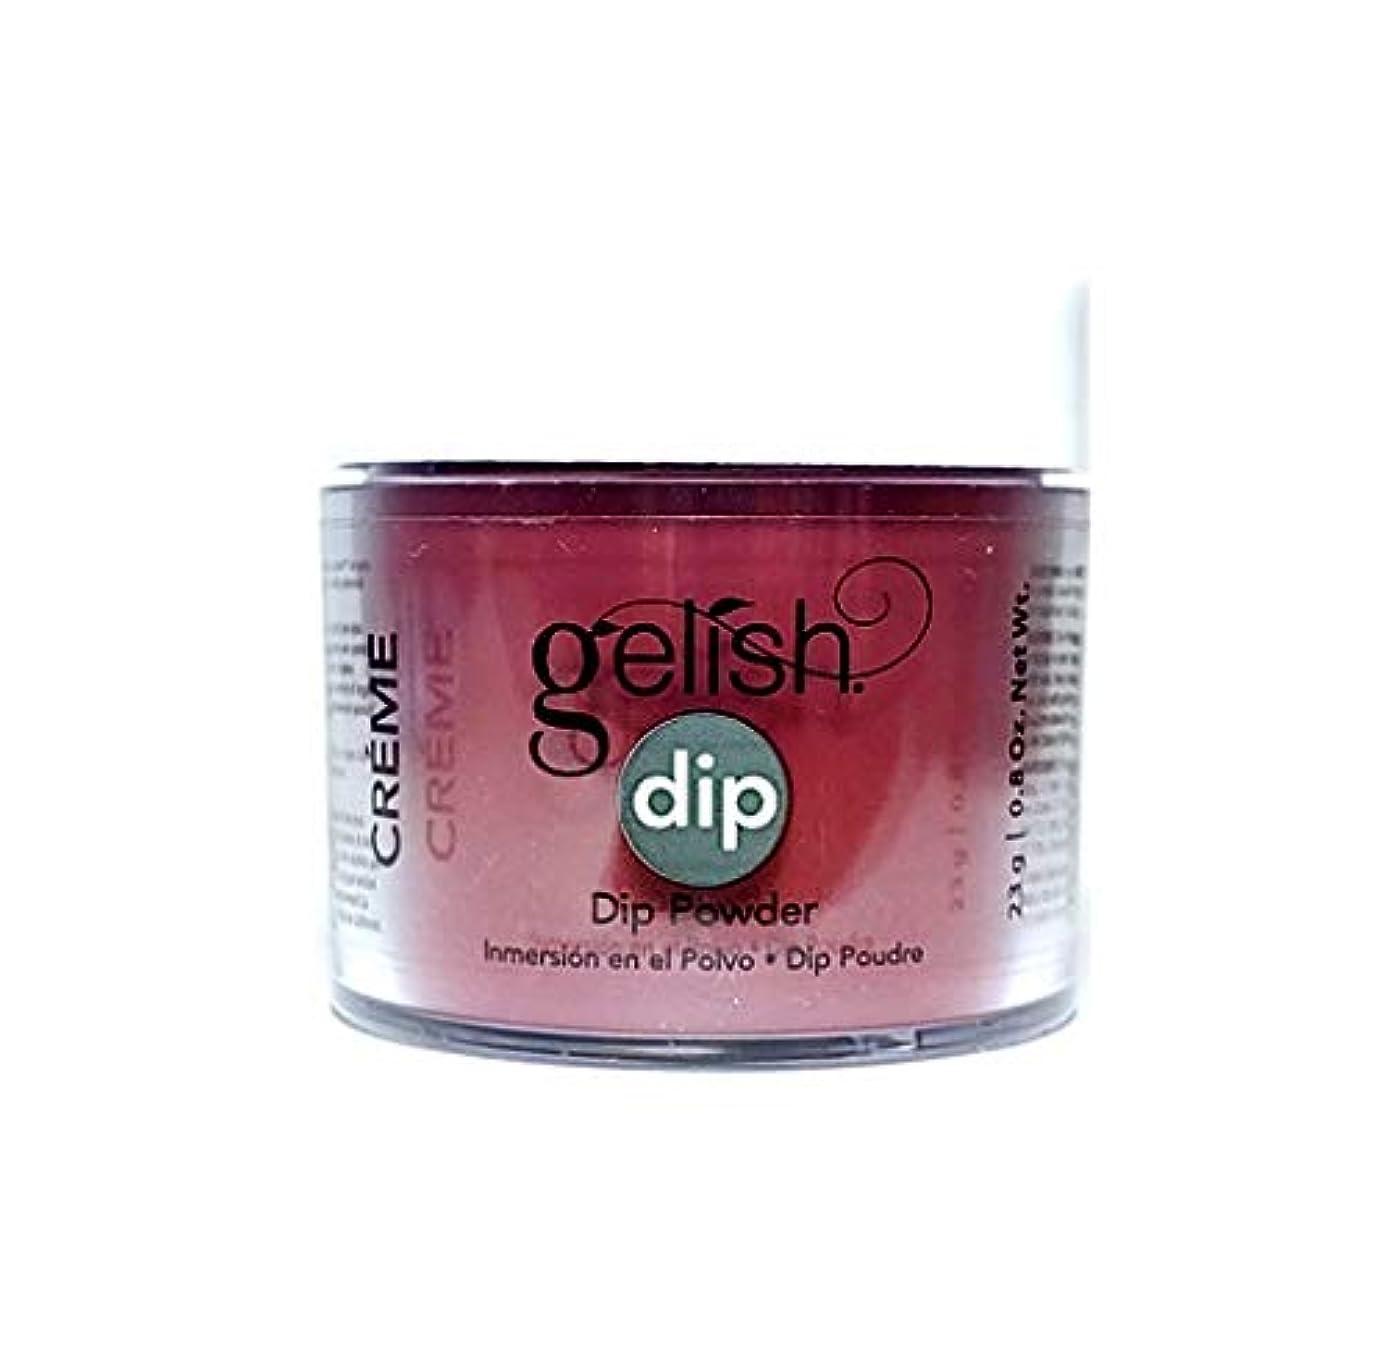 Harmony Gelish - Dip Powder - Red Alert - 23g / 0.8oz